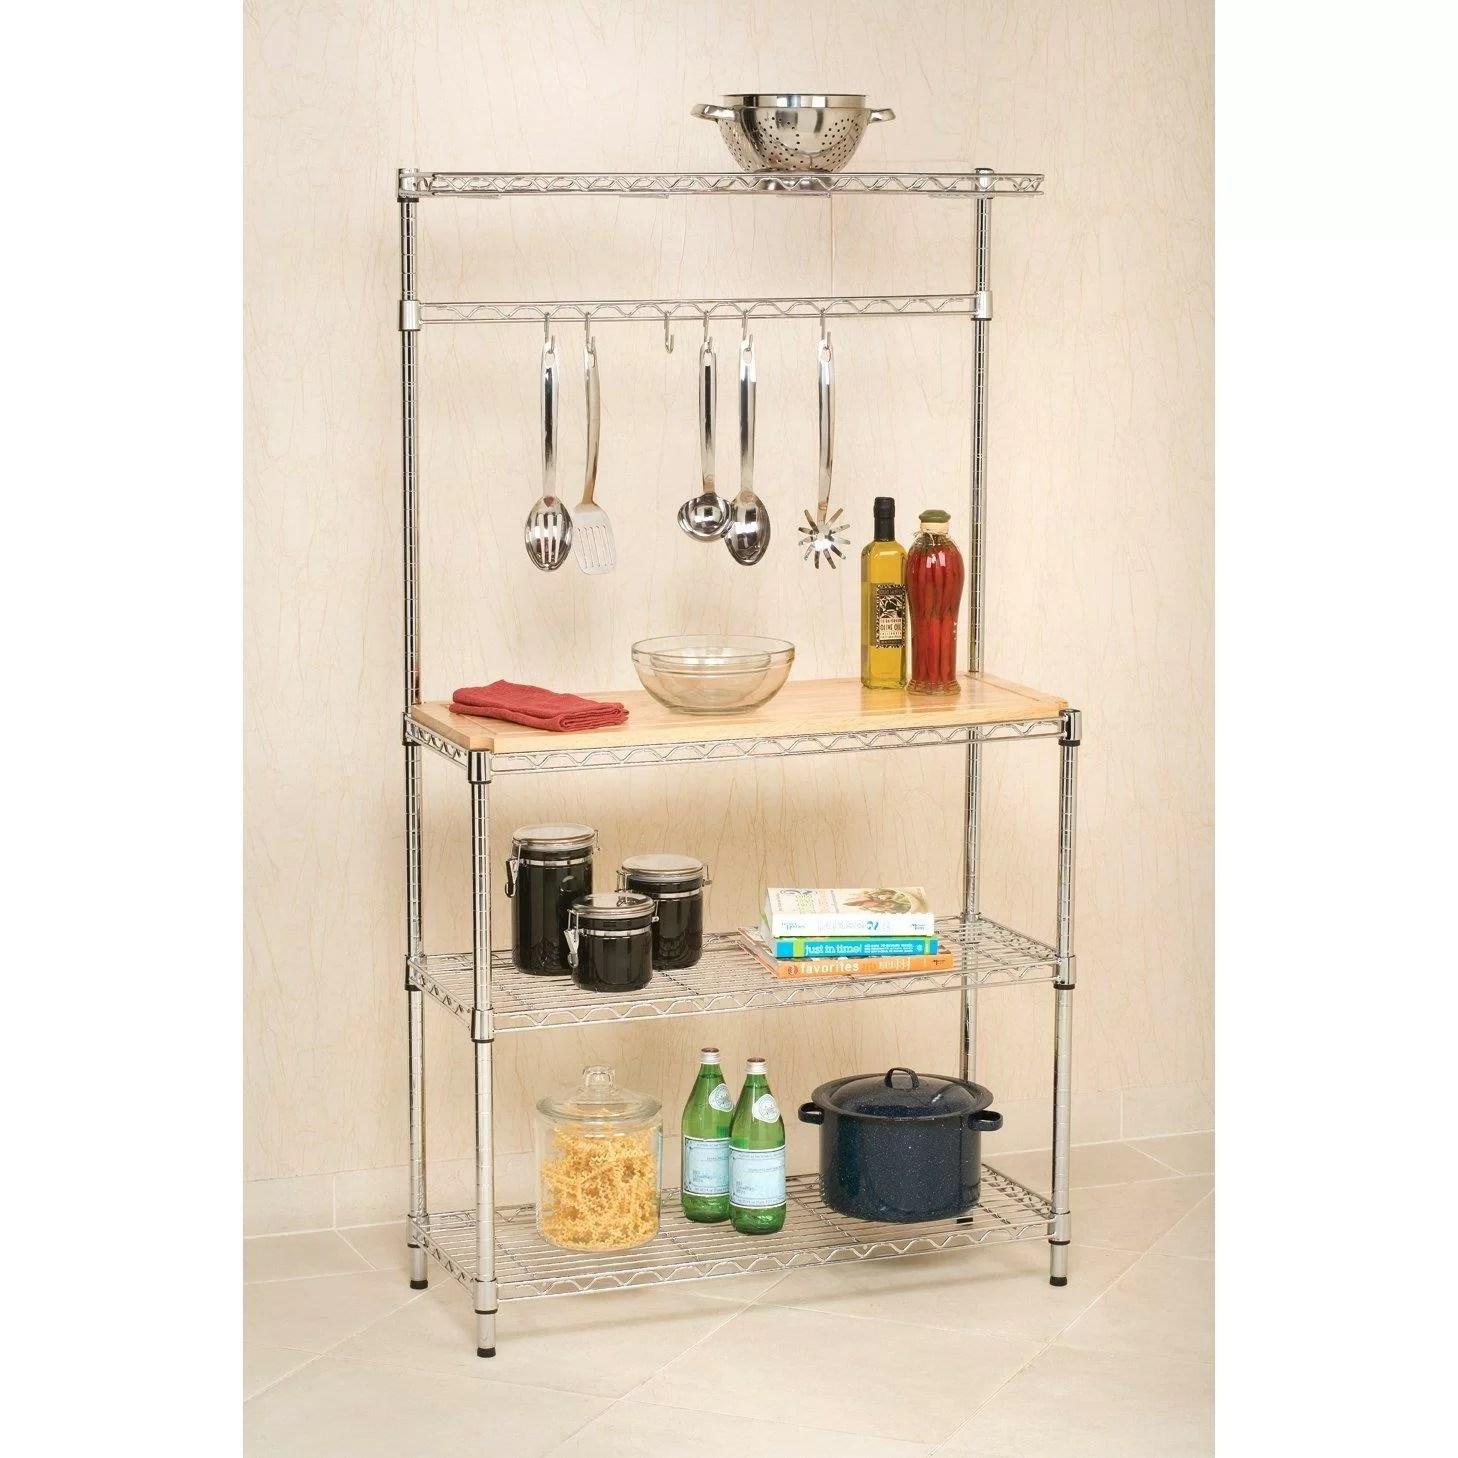 jordon 59 h x 35 w x 14 d kitchen baker rack shelf microwave stand storage cart with cutting board